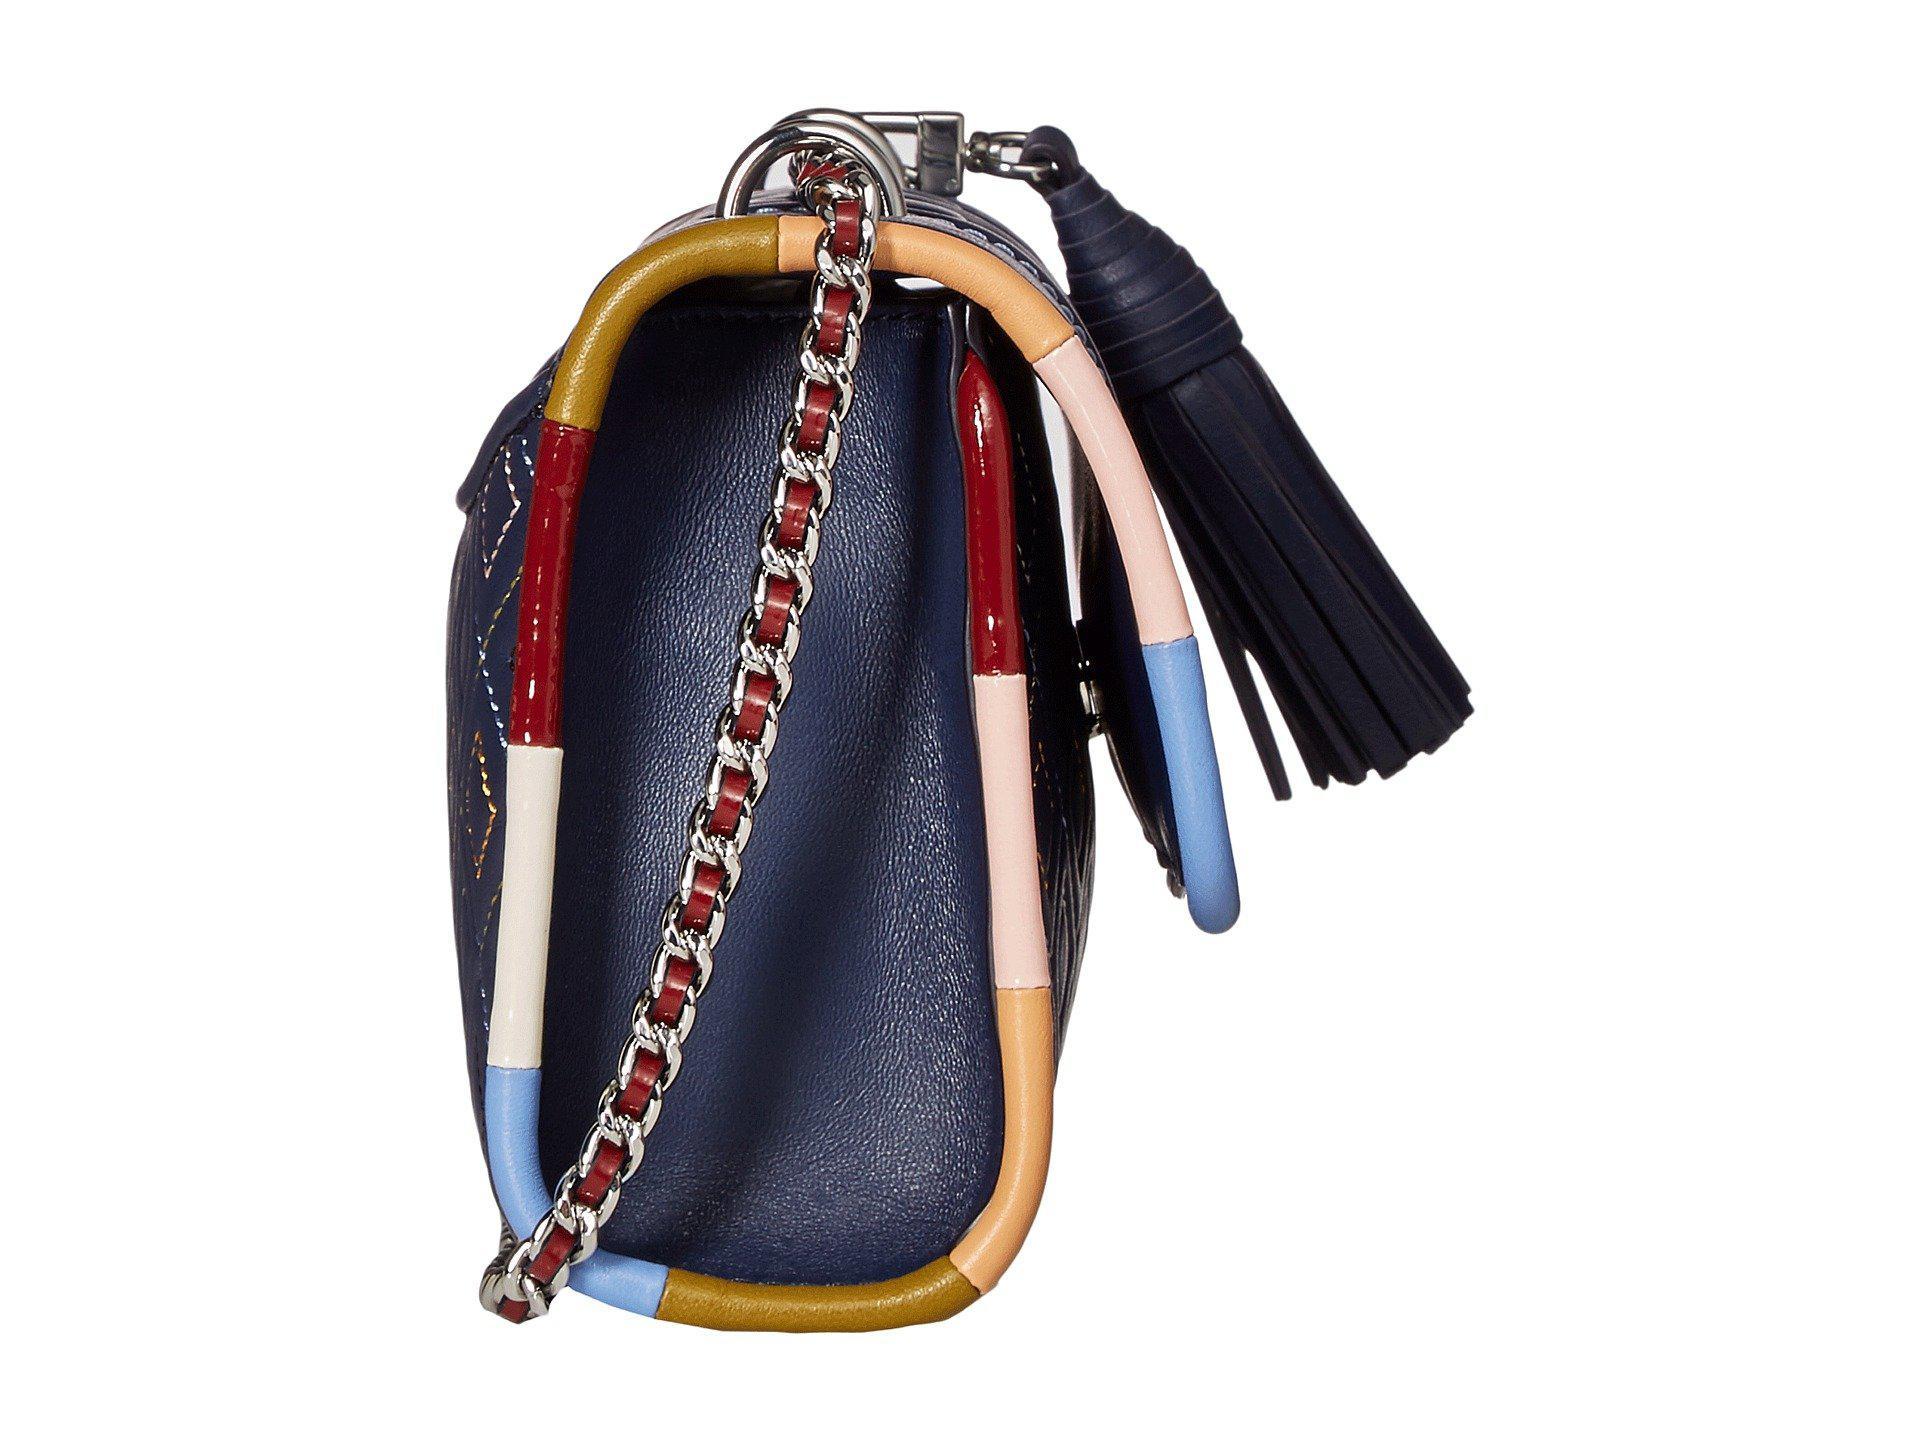 Lyst - Tory Burch Fleming Piping Small Shoulder Bag (navy Multi ... 2e8a84d2e042f